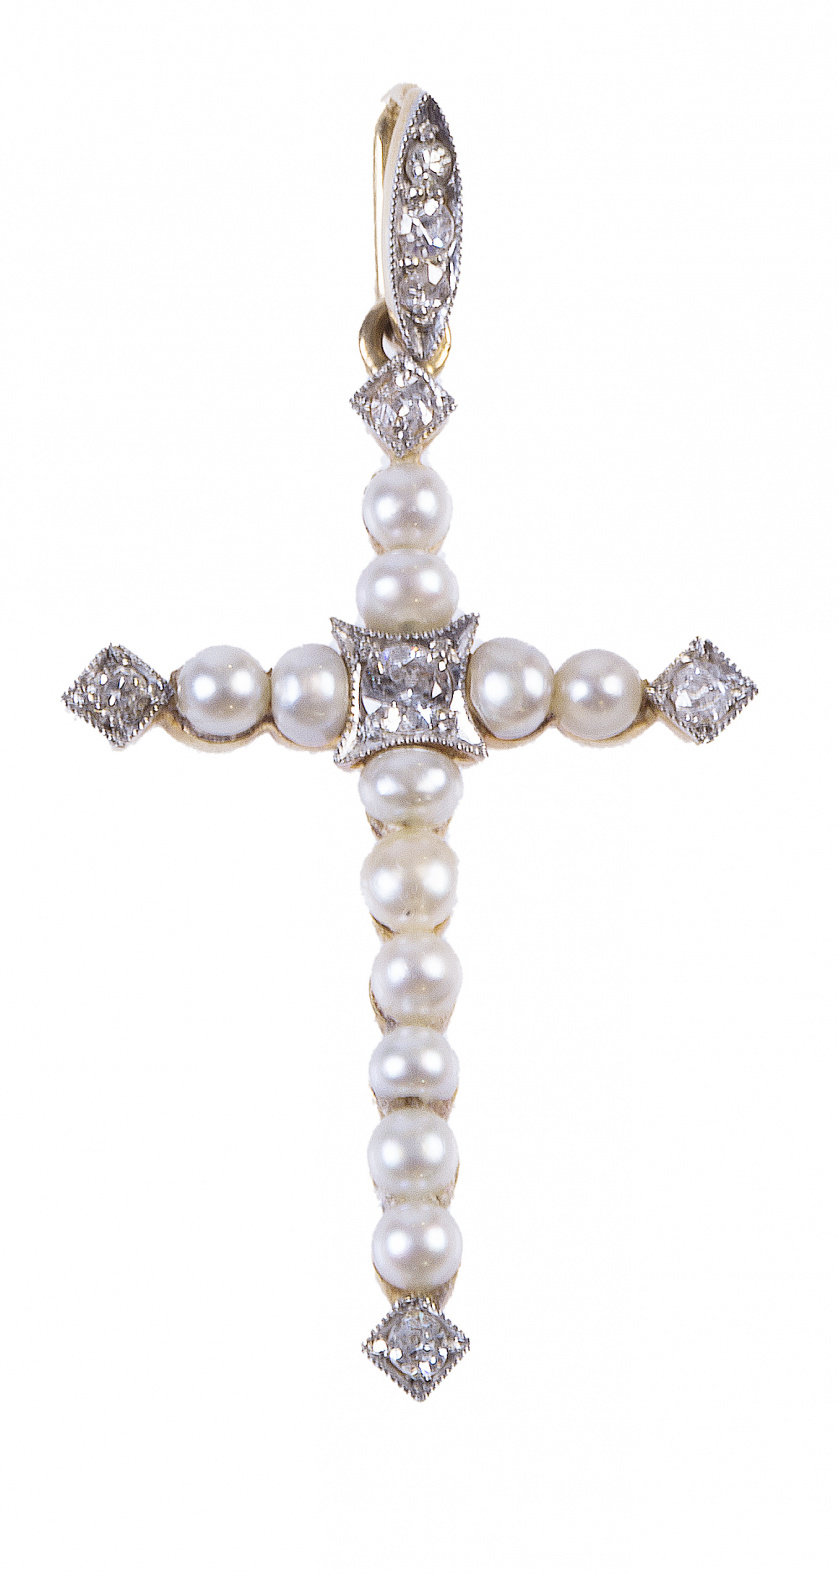 Cruz colgante de pp. S. XX de perlas finas con brillantes e